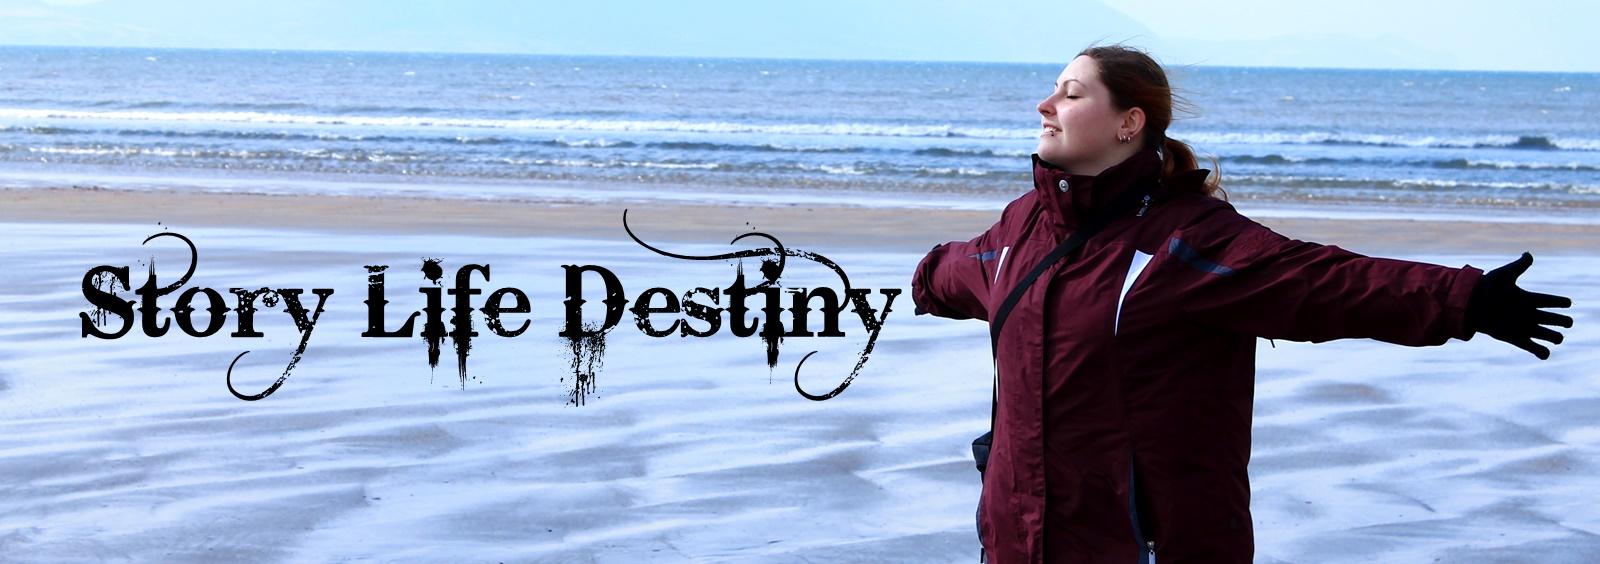 Story Life Destiny